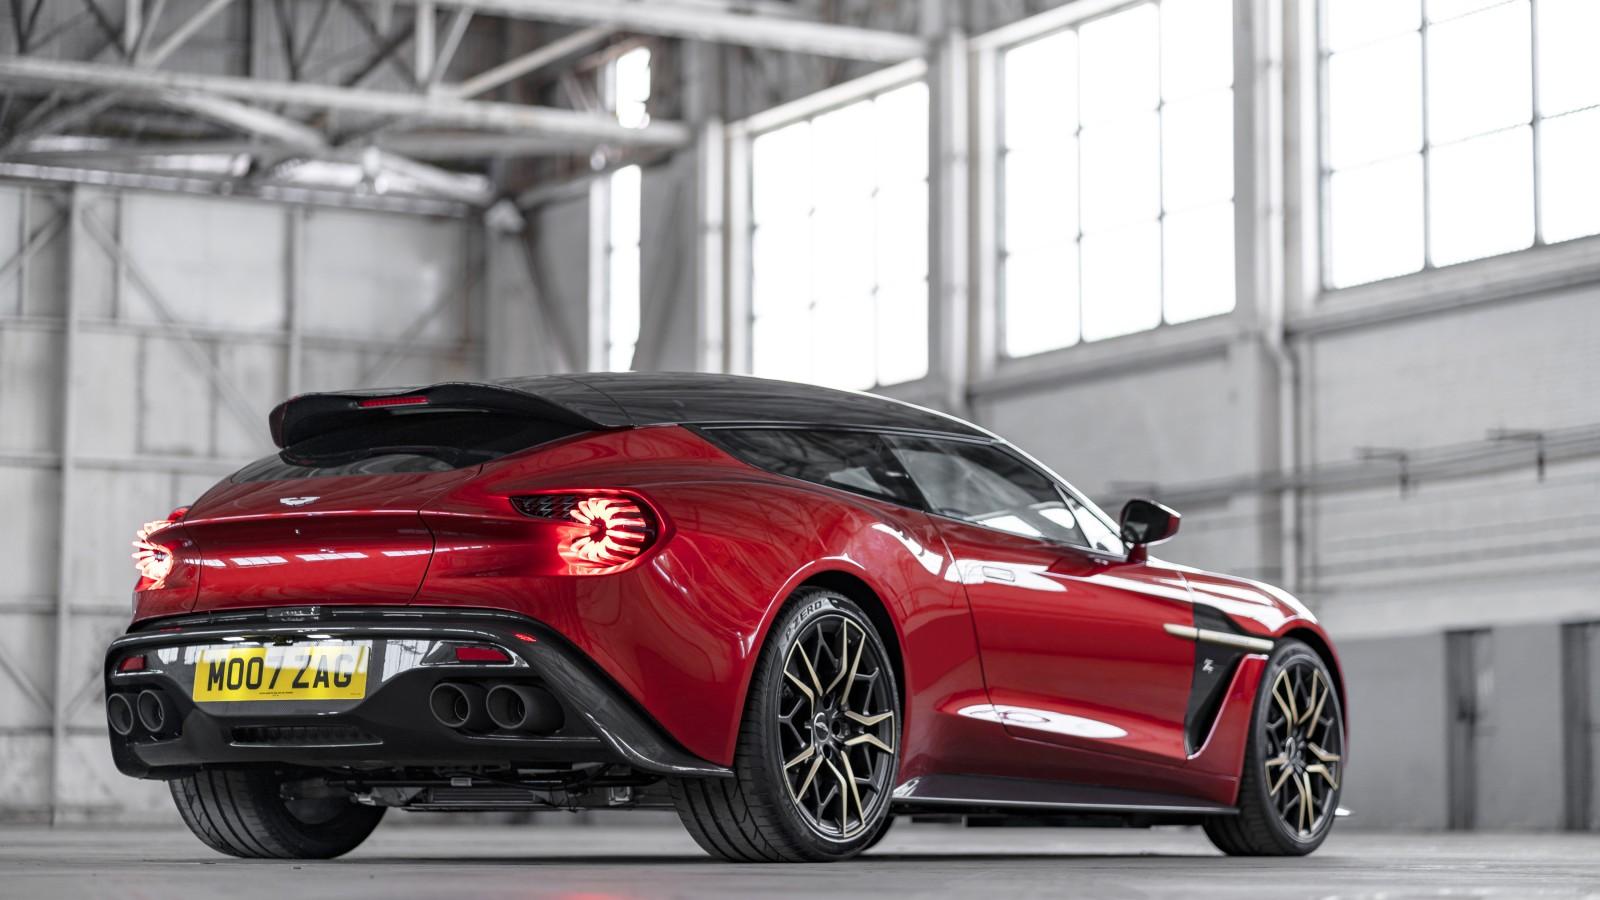 Zagato Car Wallpaper Aston Martin Vanquish Zagato Shooting Brake 2019 4k